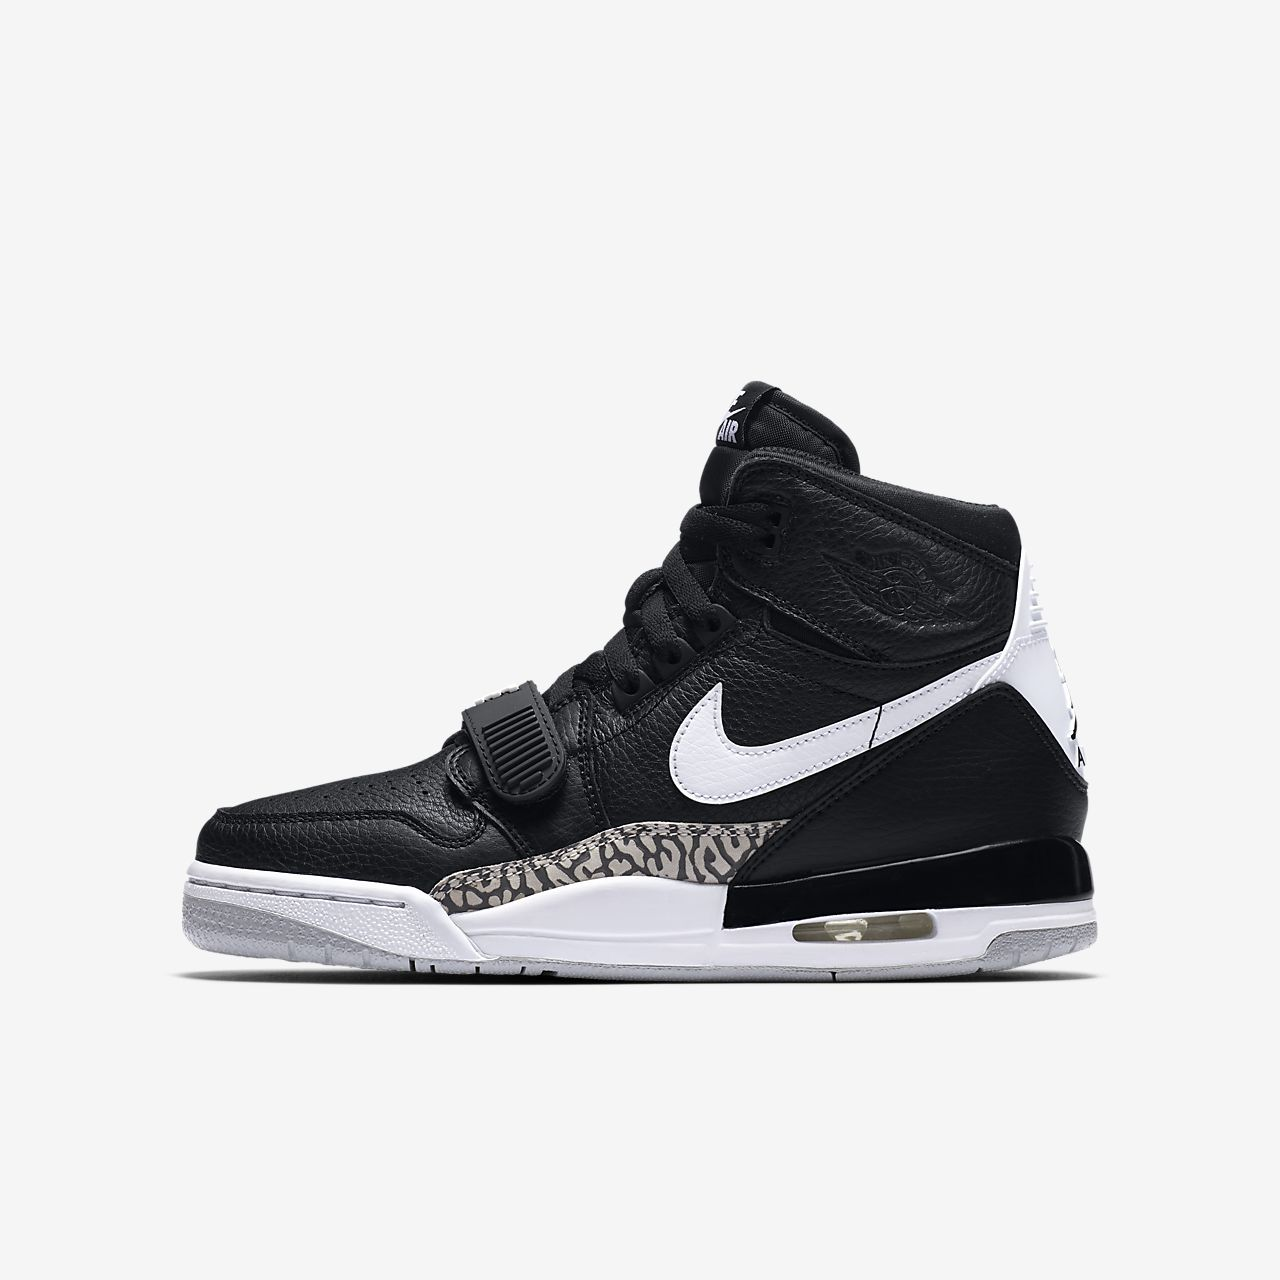 a08fe7fd94da86 Air Jordan Legacy 312 Older Kids  Shoe. Nike.com AT